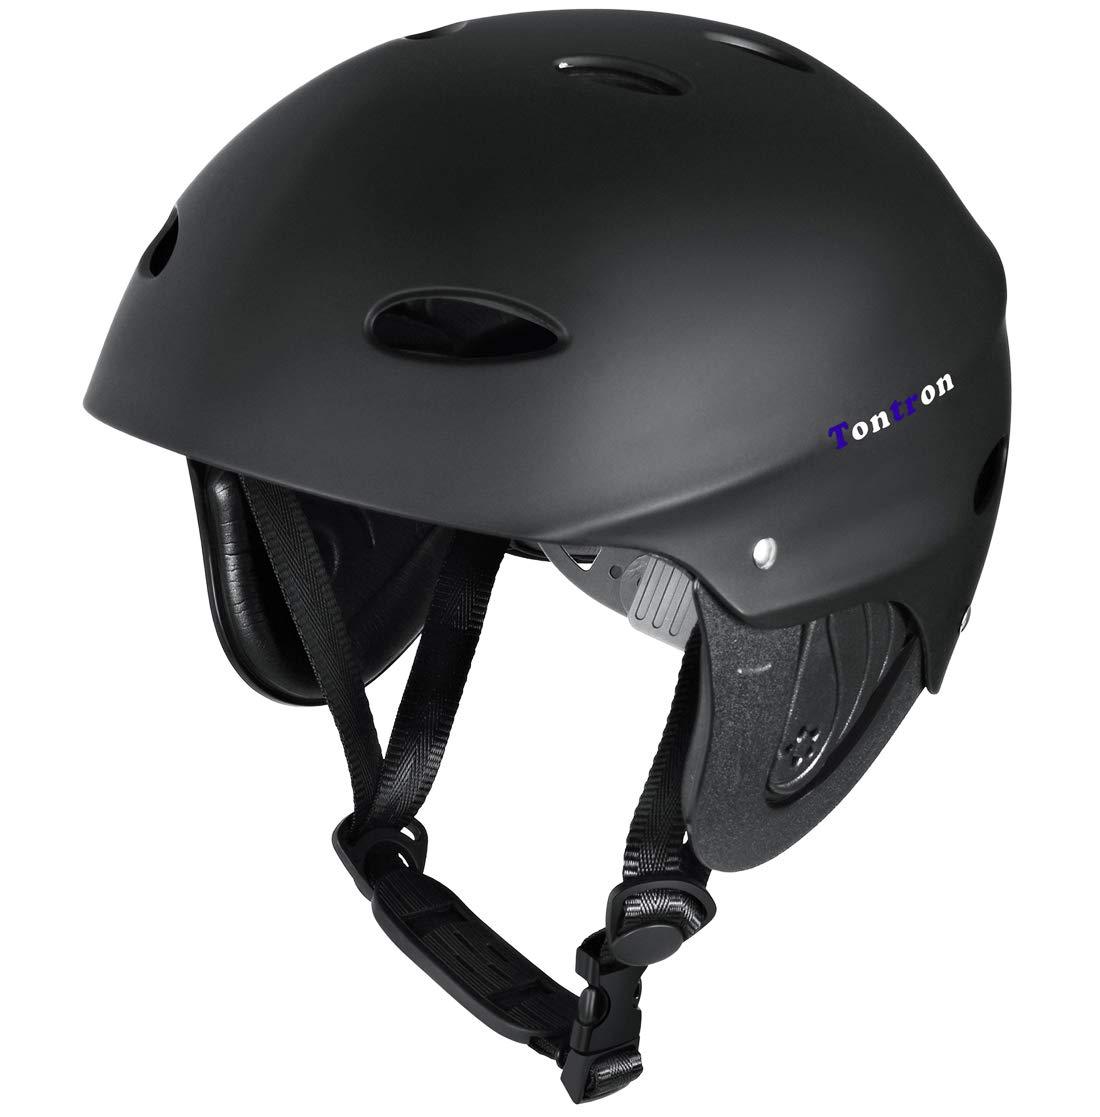 Tontron Adult Whitewater Kayaking Canoeing Bike Skate Multi-Sports Helmet (Matte X-Black, Large) by Tontron